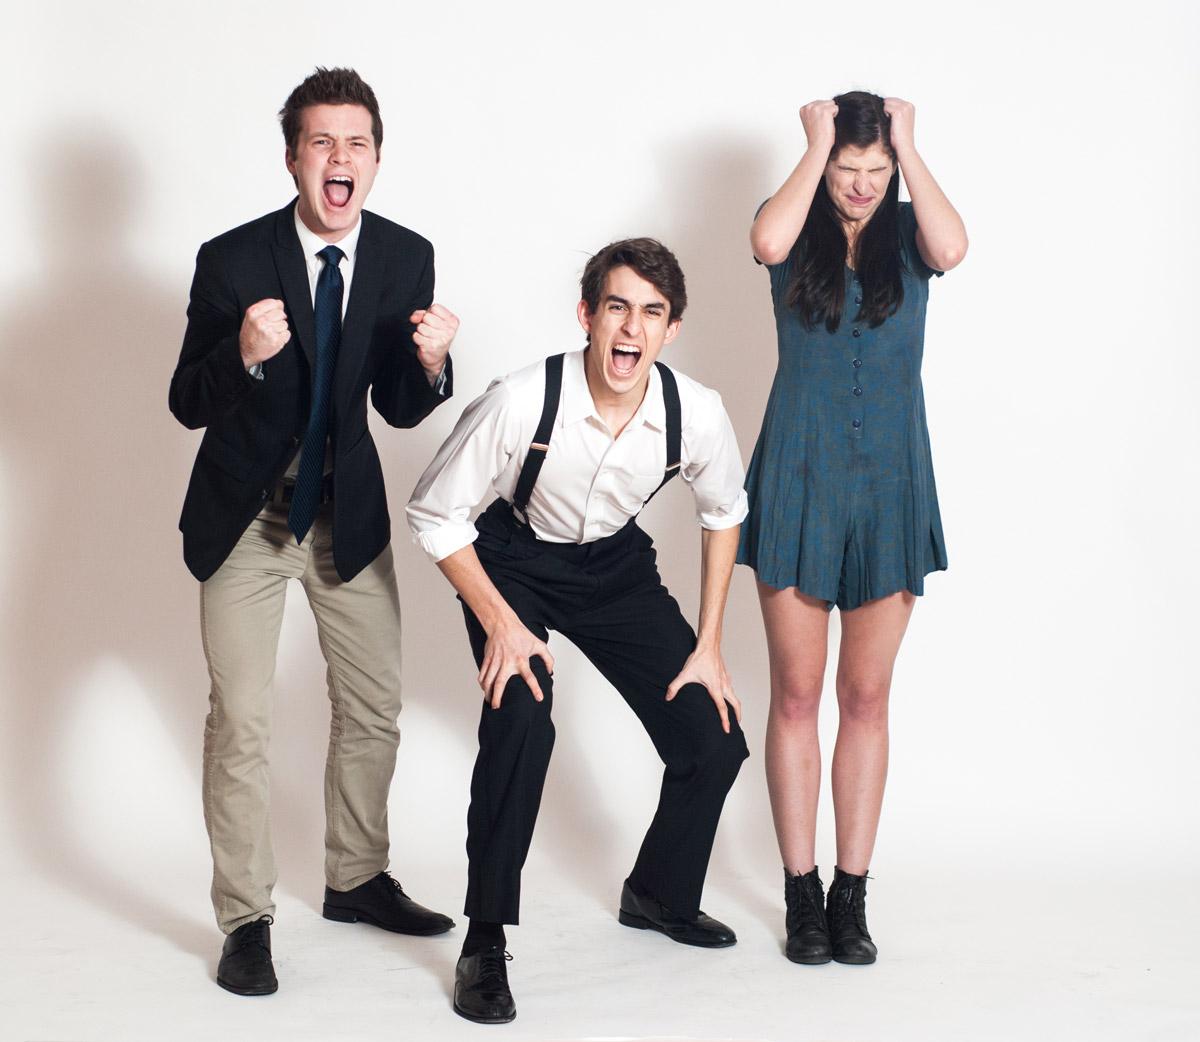 actors screaming